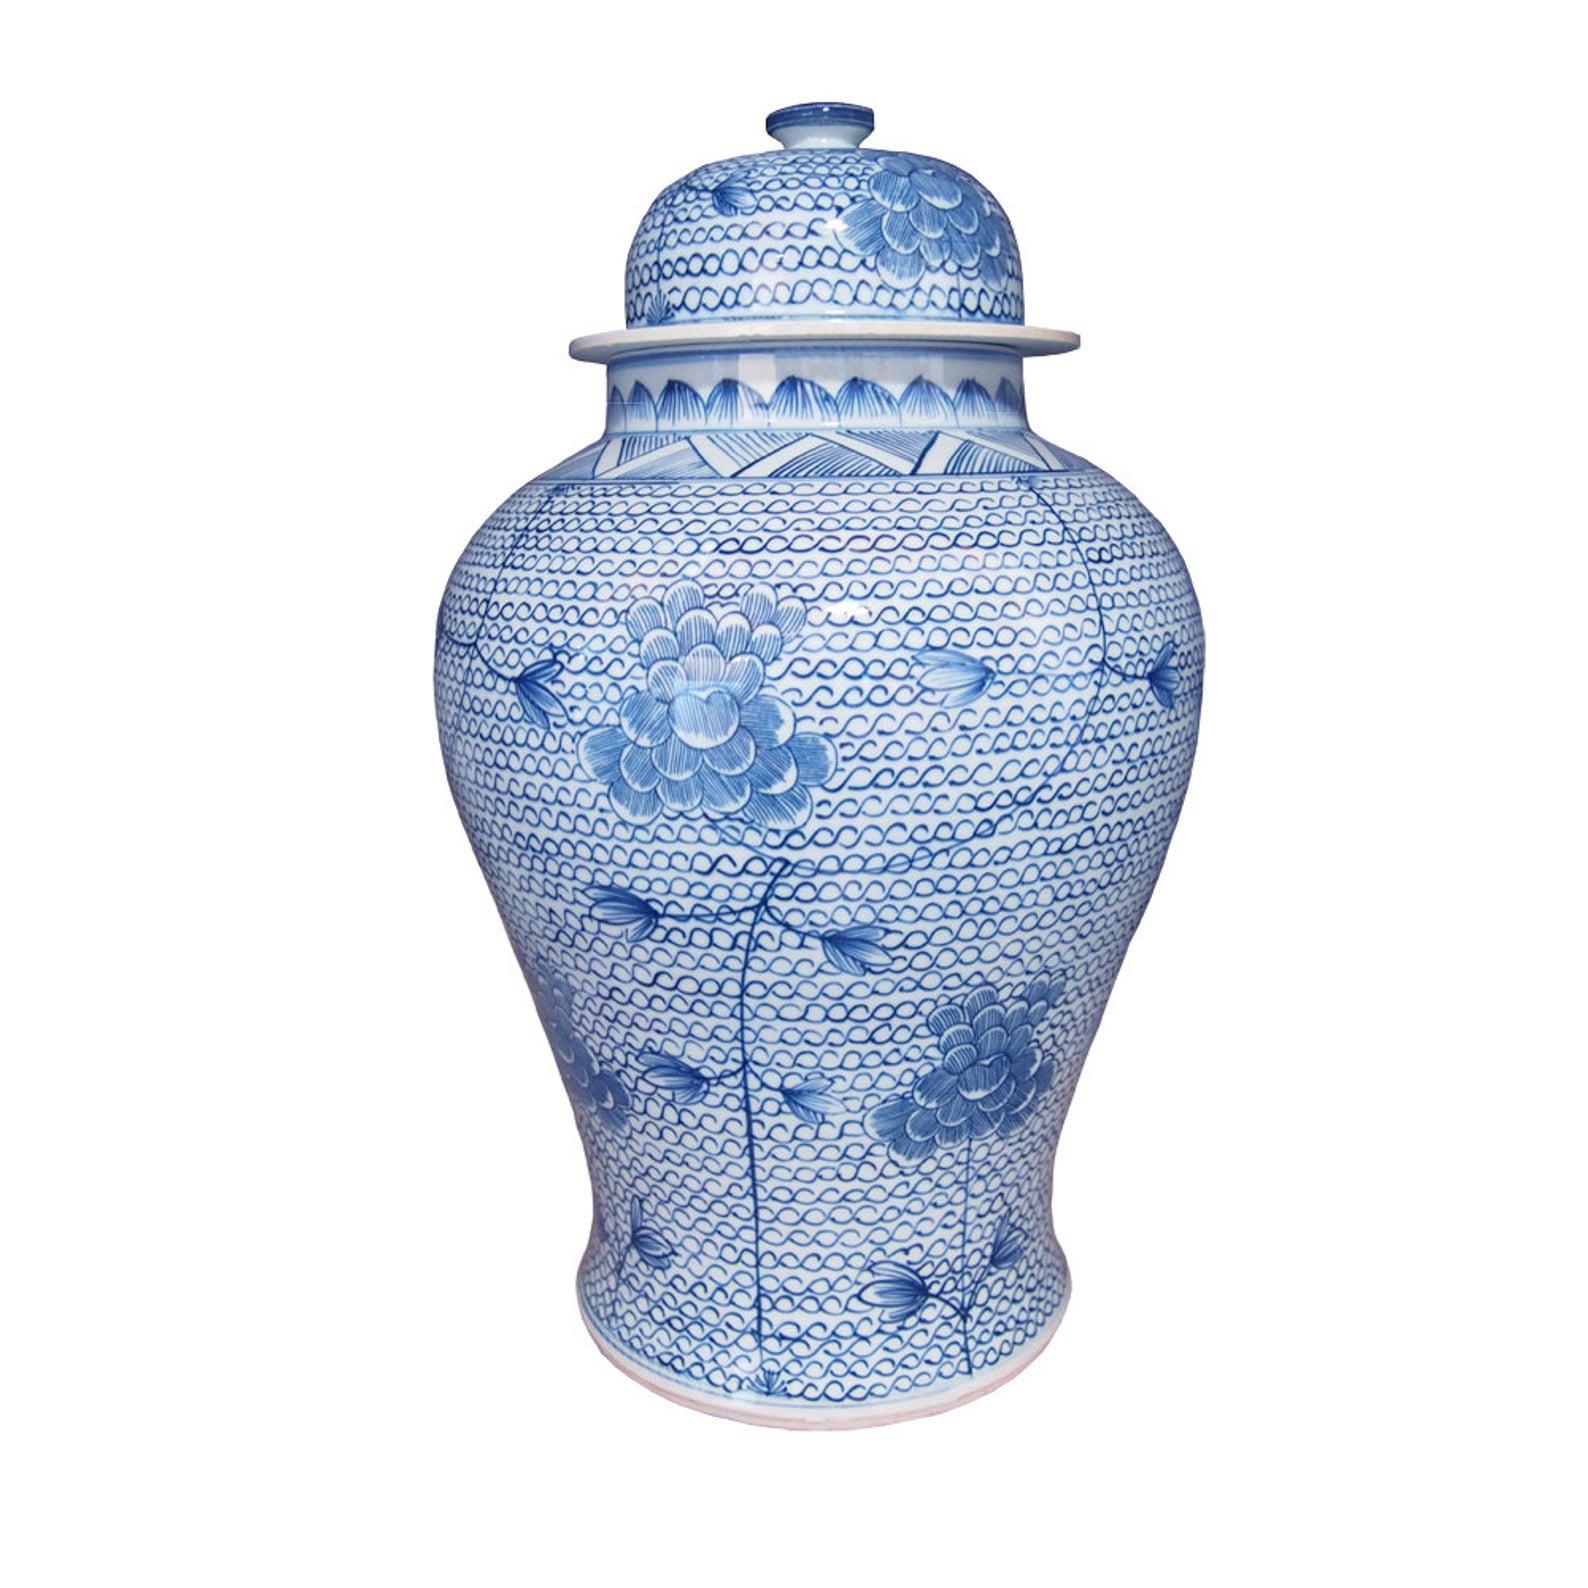 Blue and White Handmade Porcelain Ginger Jar - Chain Link Lotus Blossom